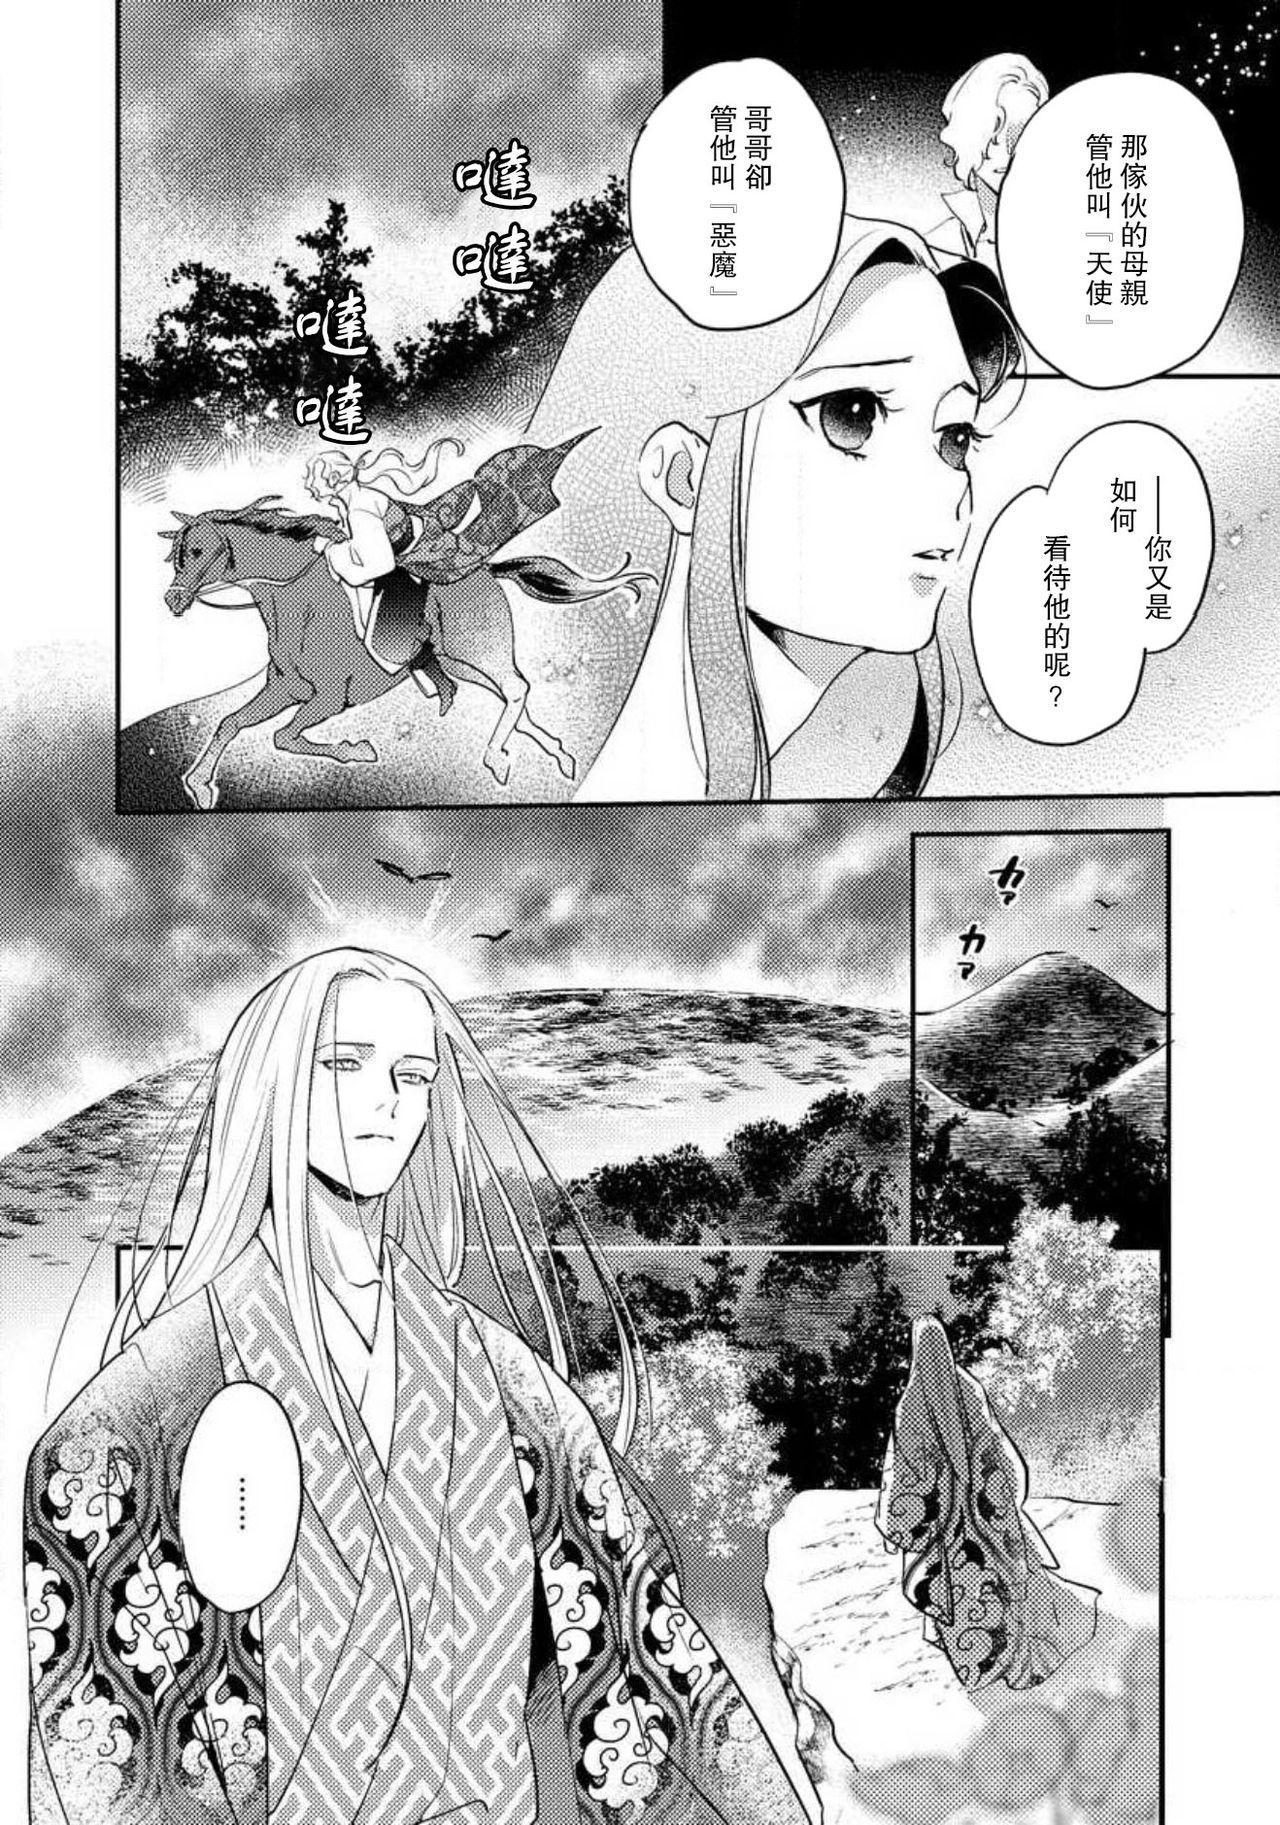 Oeyama suimutan utsukushiki oni no toraware hime | 大江山醉夢逸話 美麗的鬼與被囚禁的公主 Ch. 1-8 155